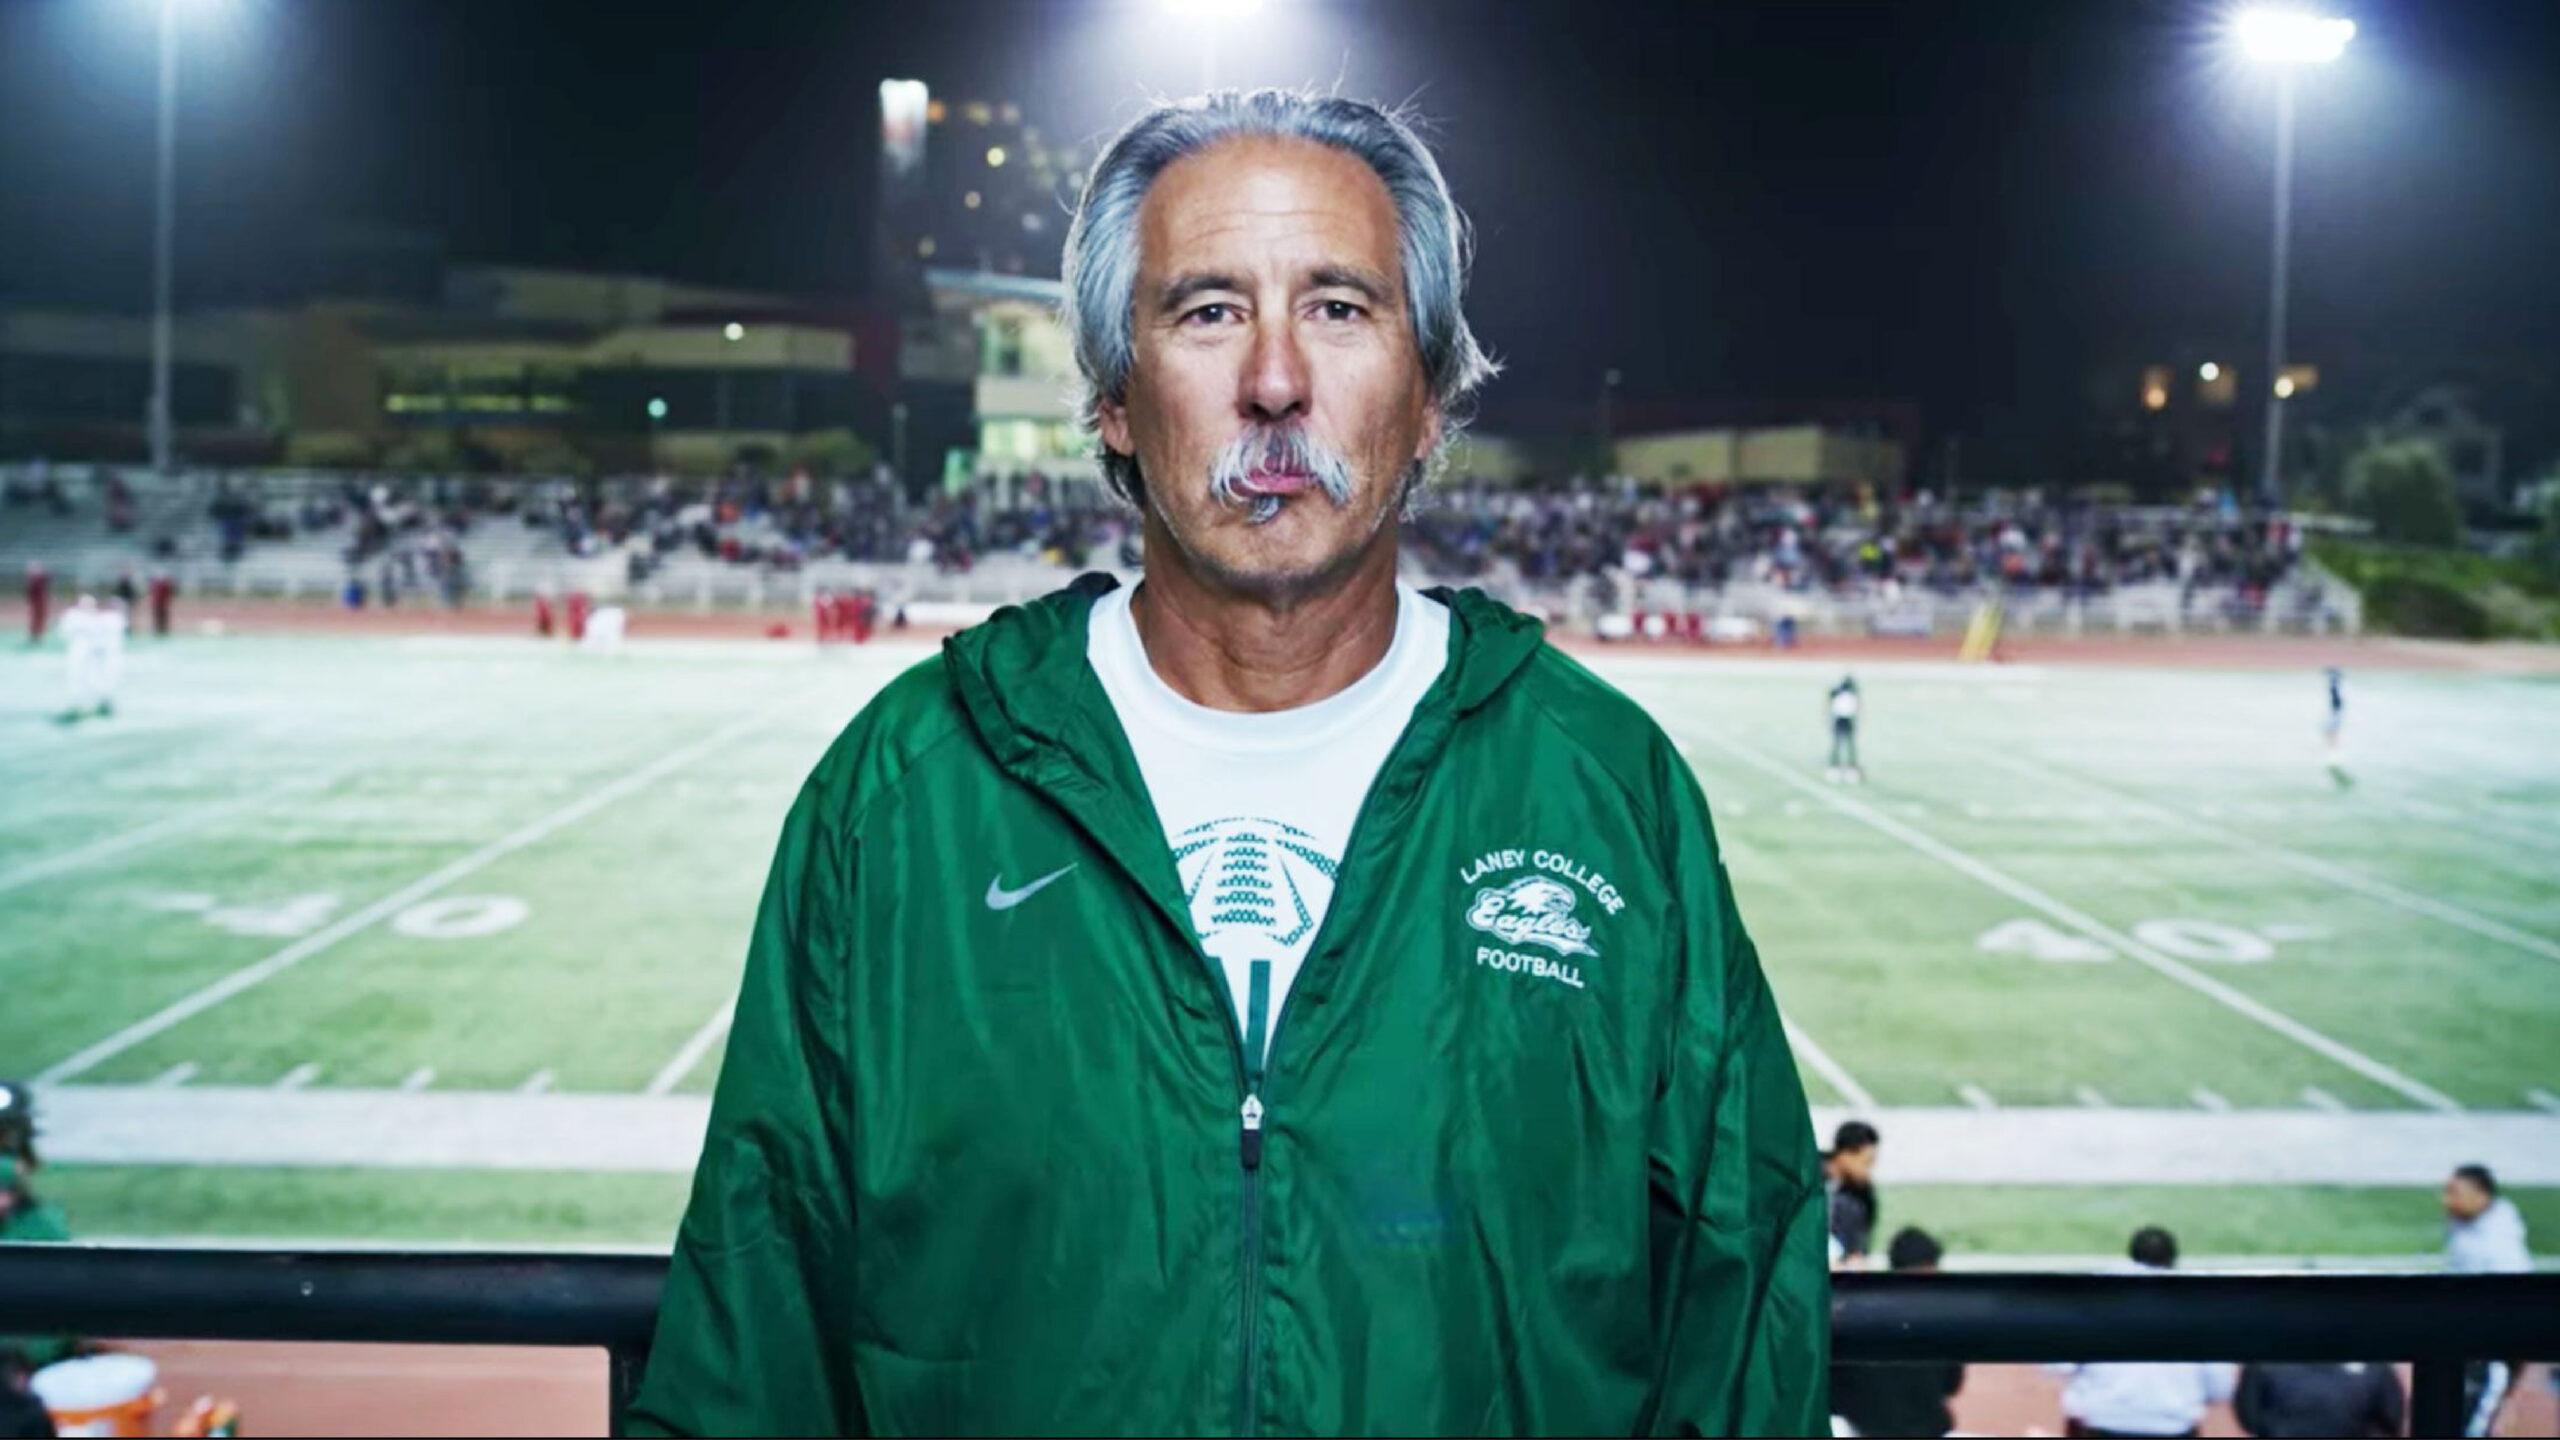 Head coach of Laney College, John Beam. (Photo courtesy John Beam)